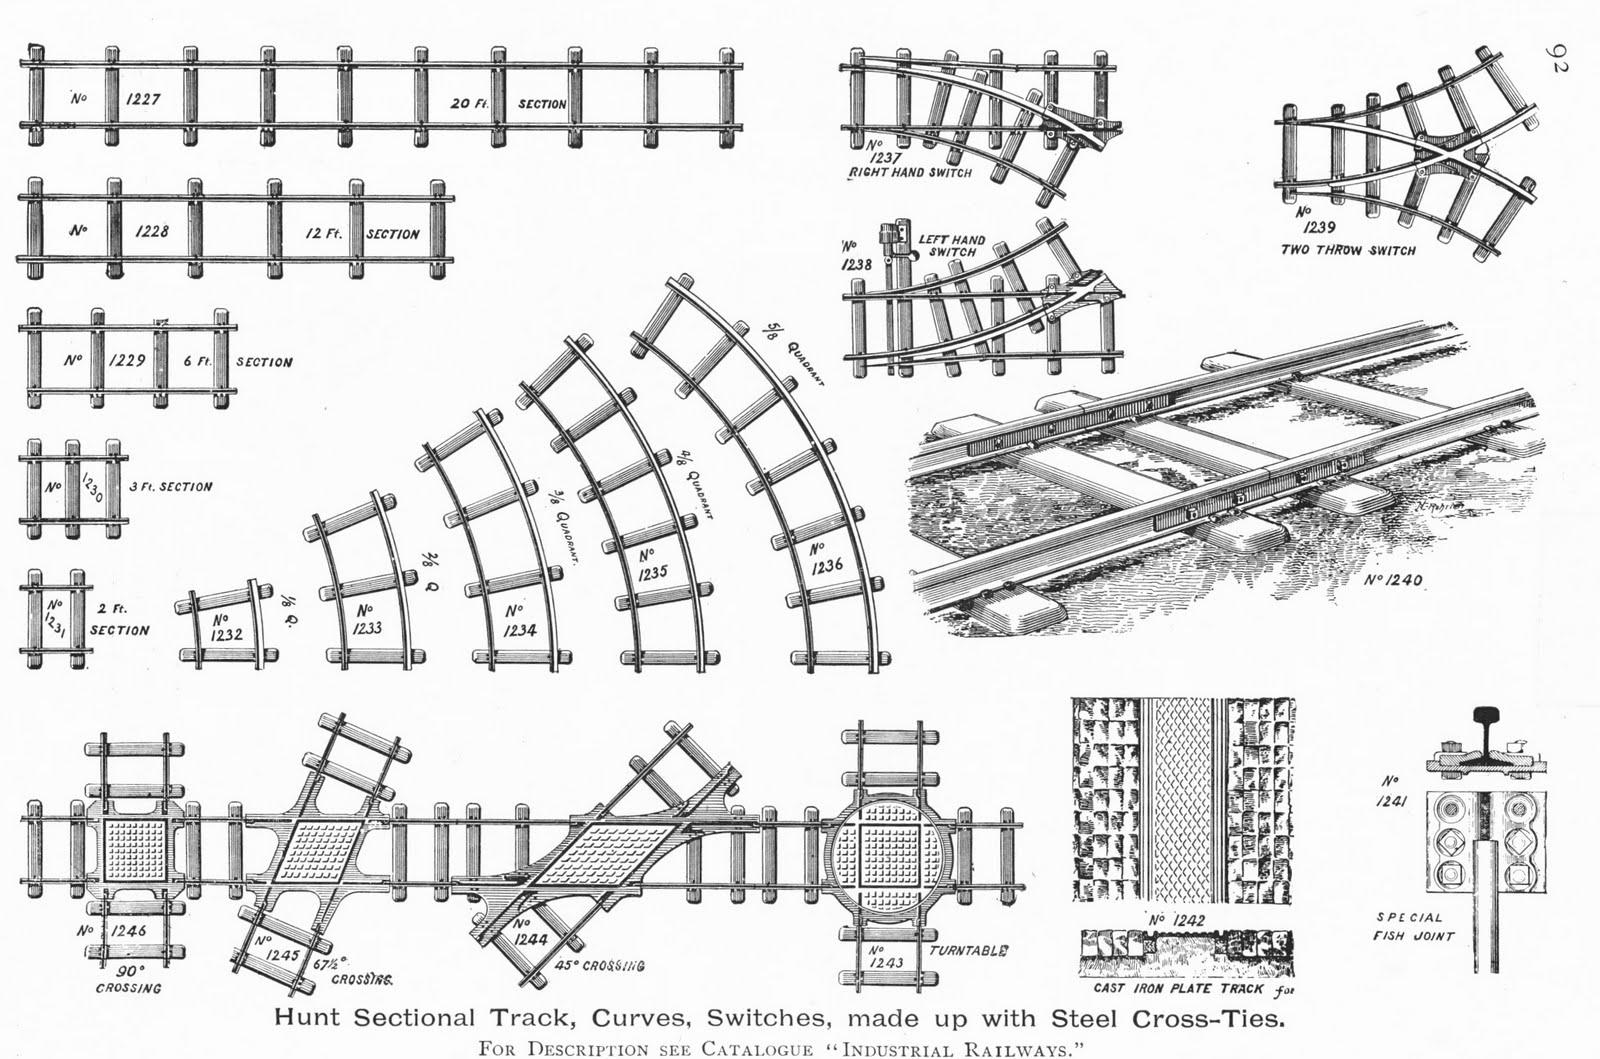 Model Railroad Minutiae: Brick works plant track